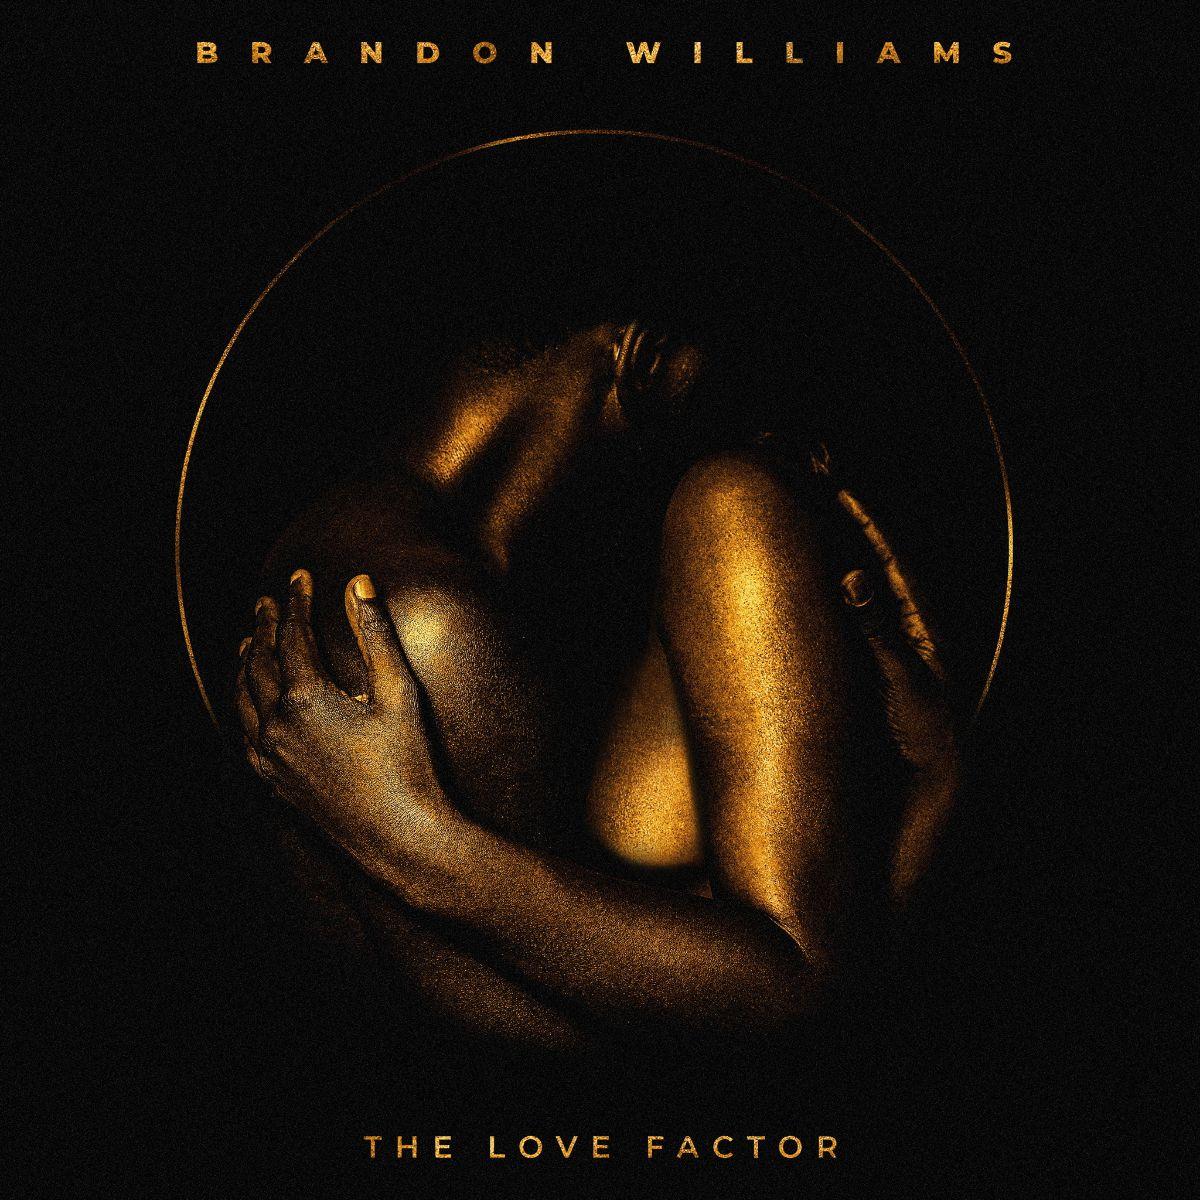 Brandon Williams The Love Factor